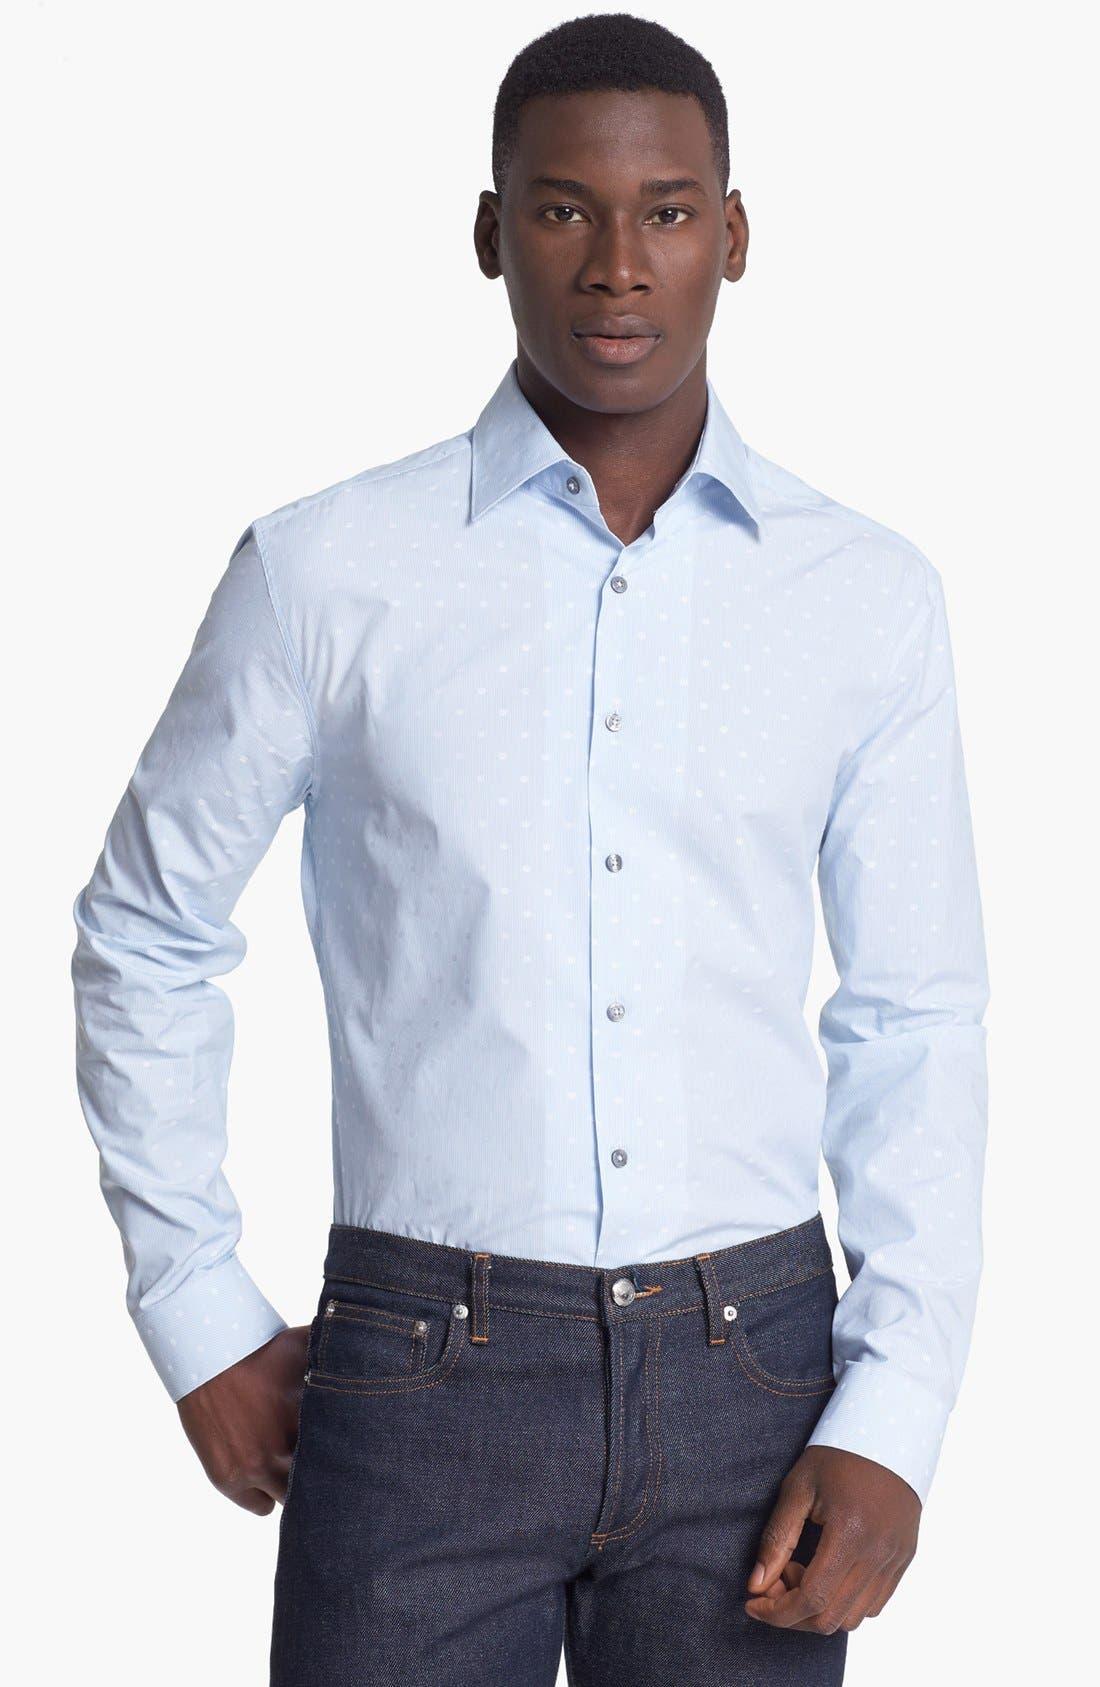 Main Image - Paul Smith London Slim Fit Dot Stripe Dress Shirt